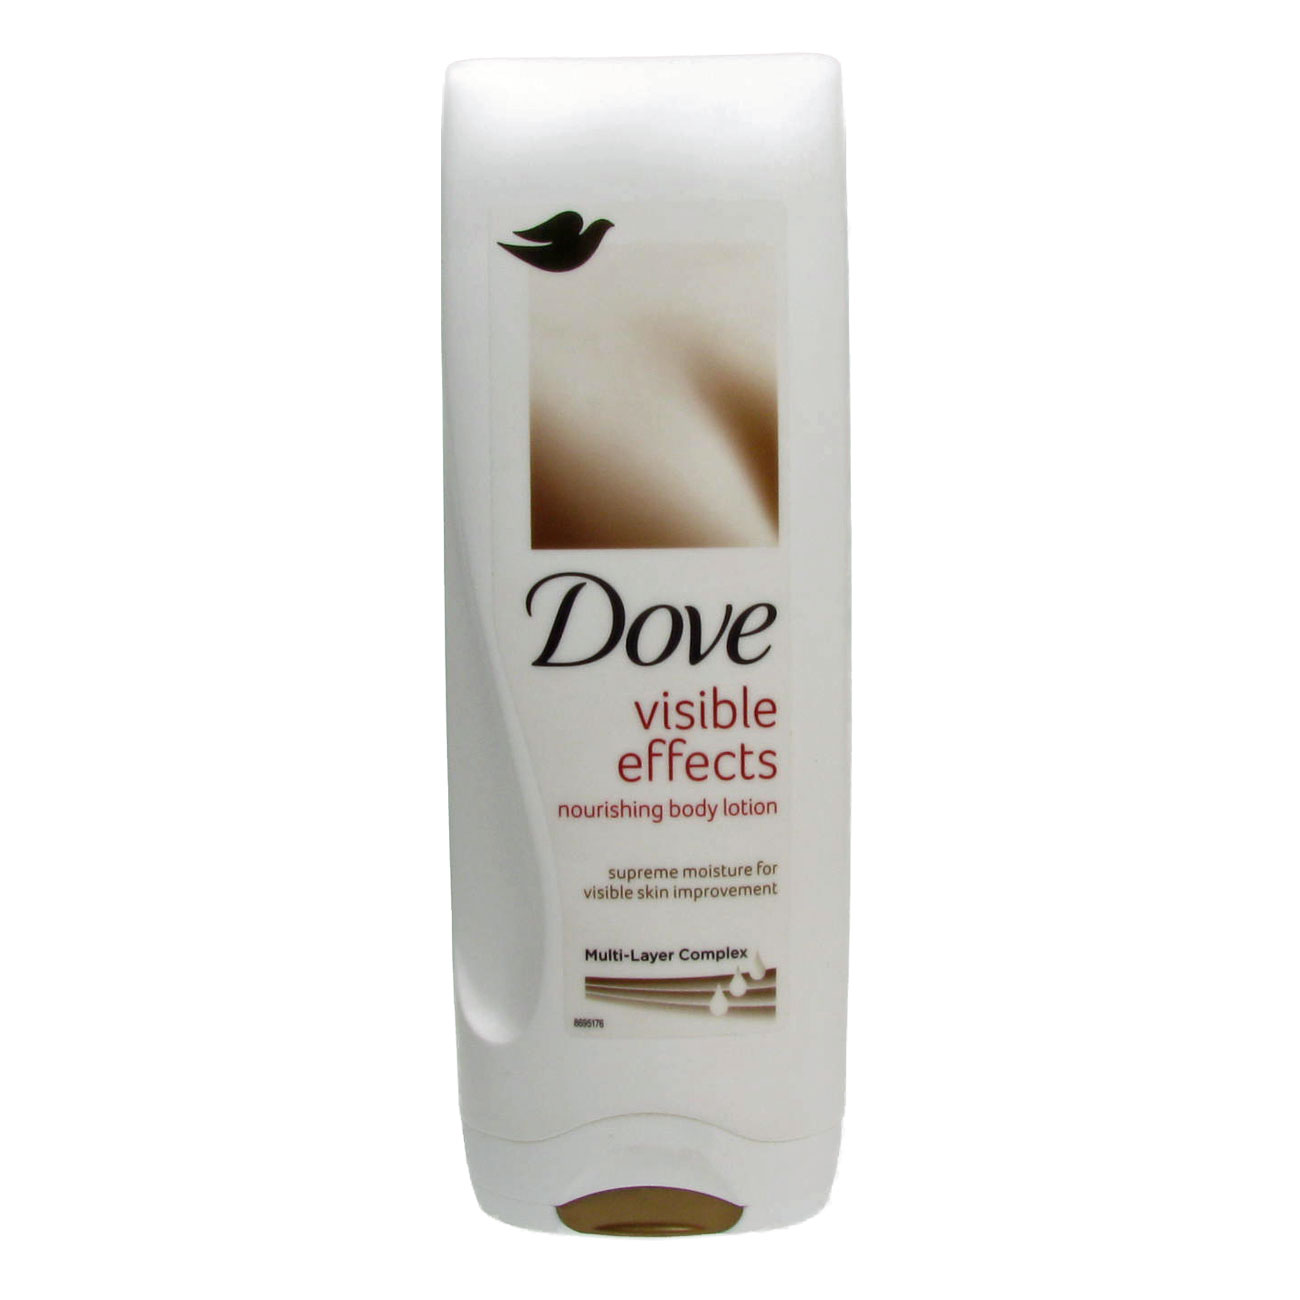 Dove deep moisture facial lotion